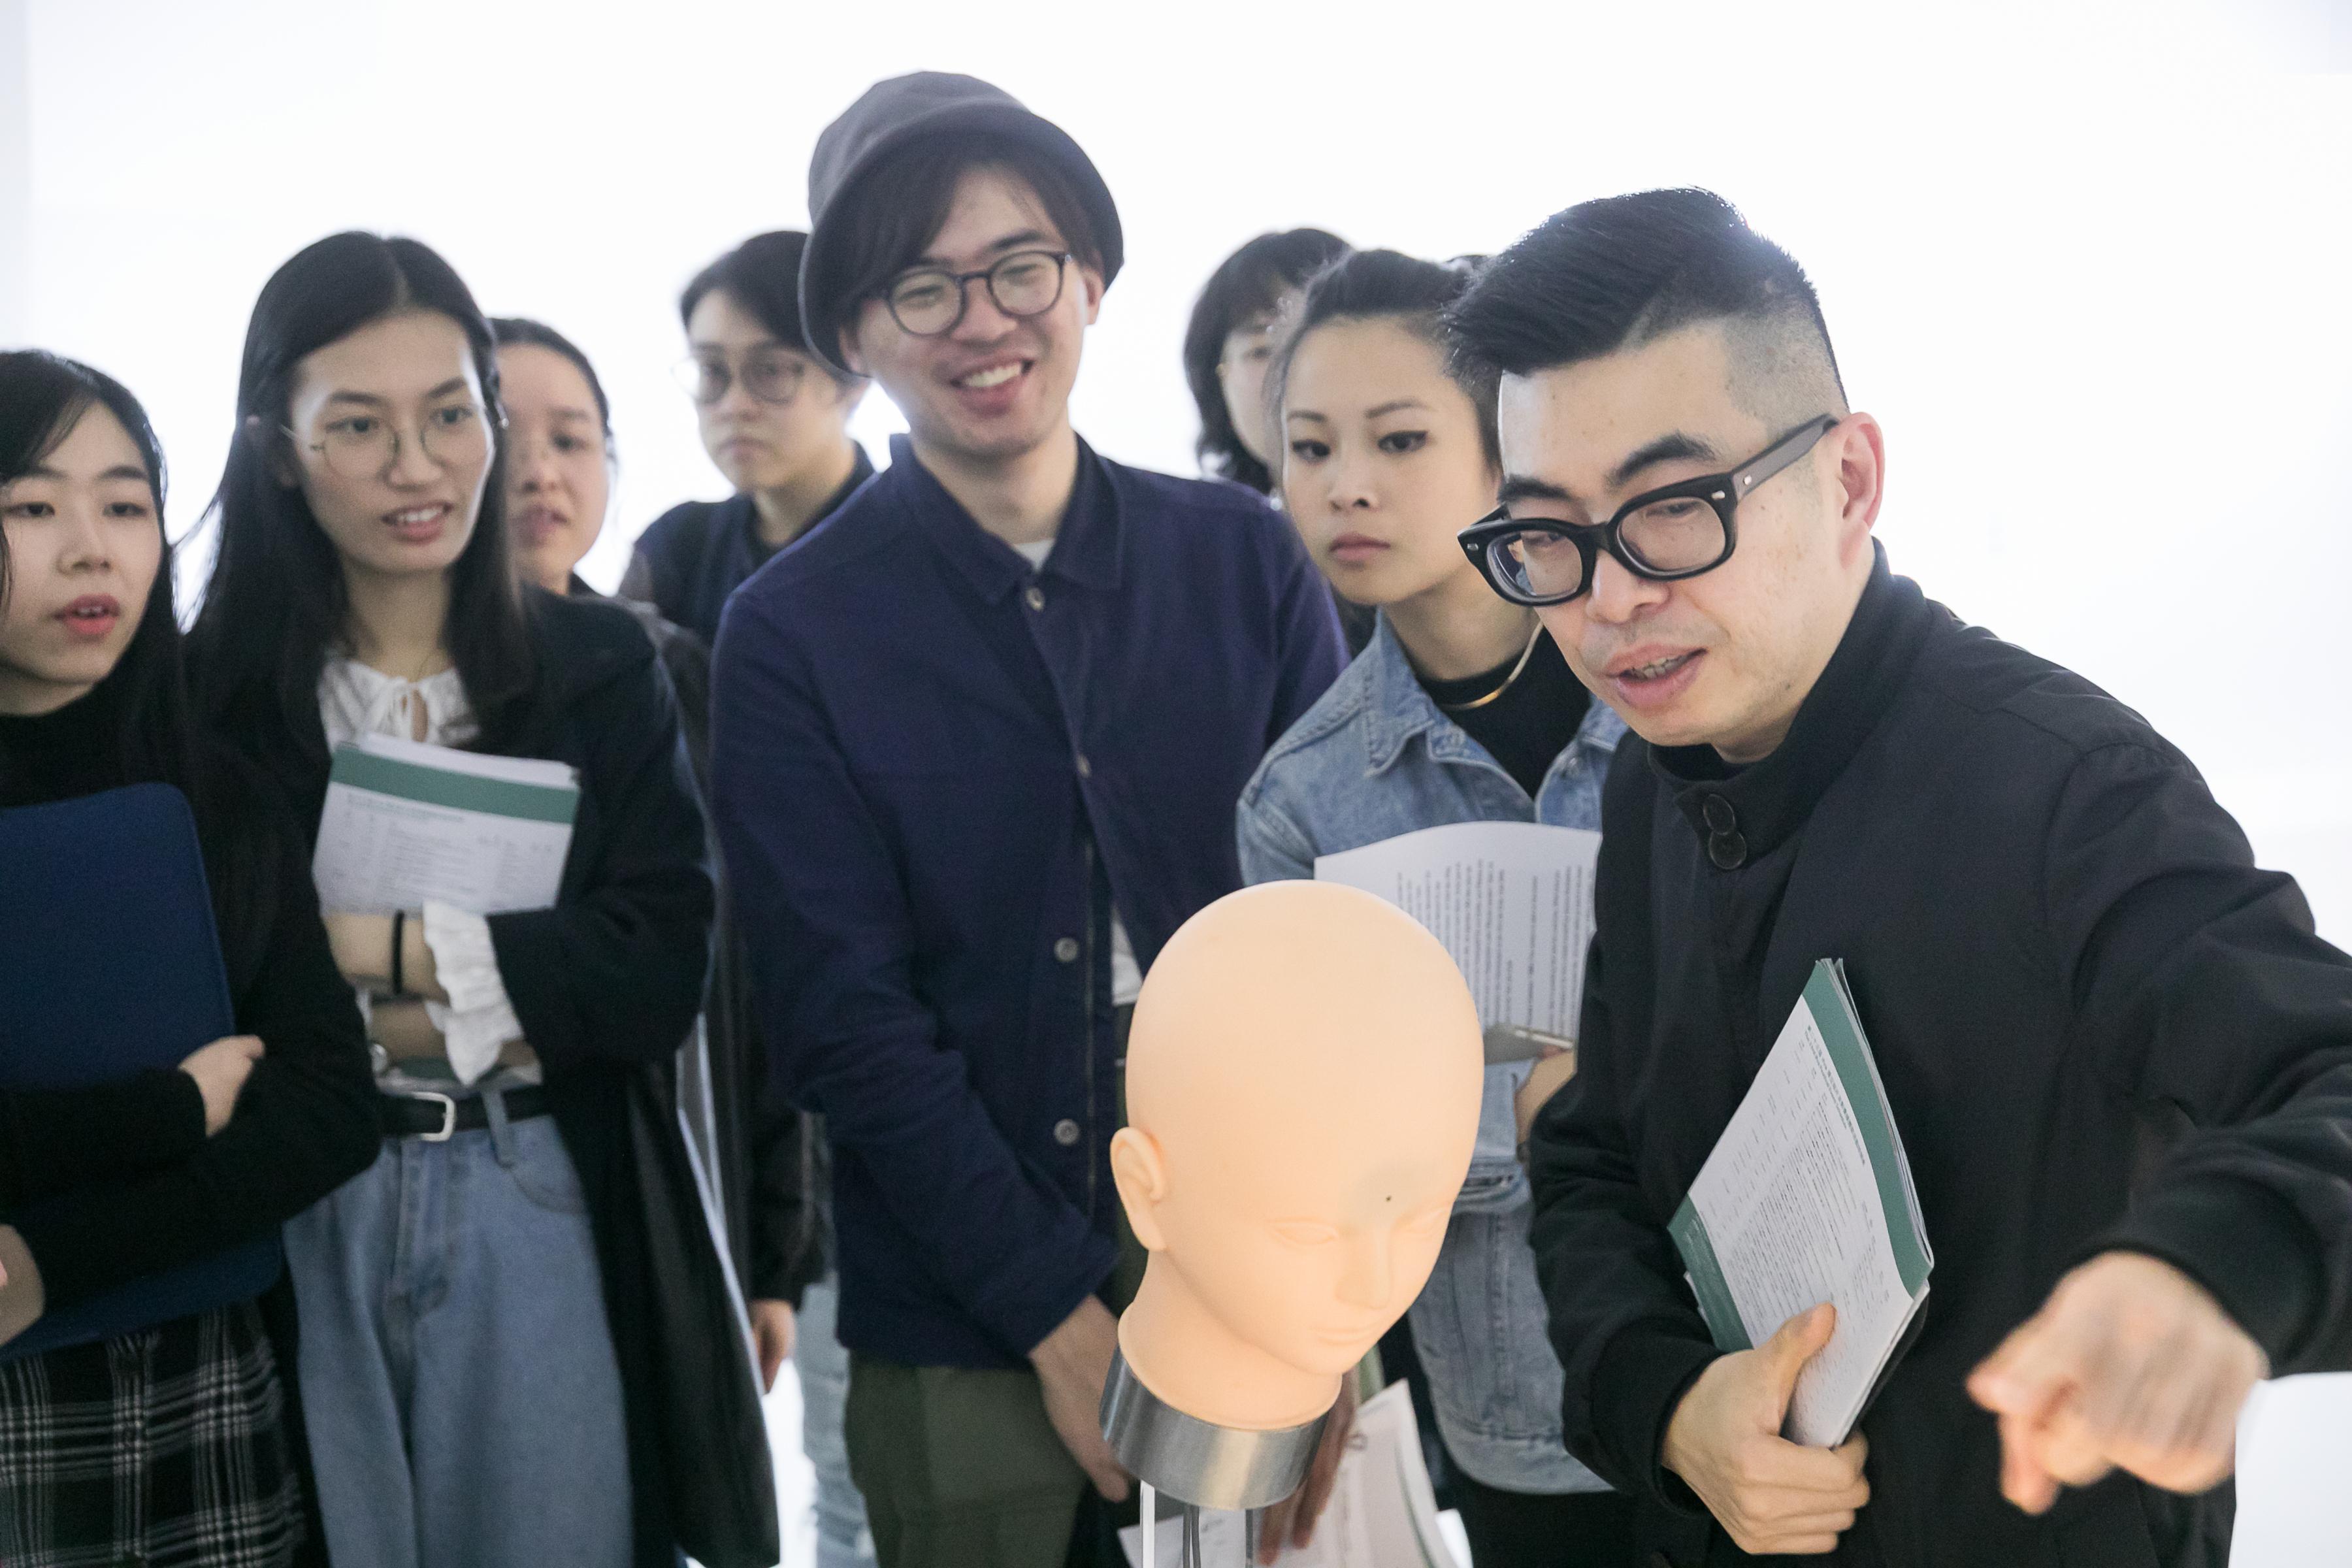 Curator Ip Yuk-yiu introducing Shinseungback Kimyonghun (South Korea)'s artwork FADTCHA